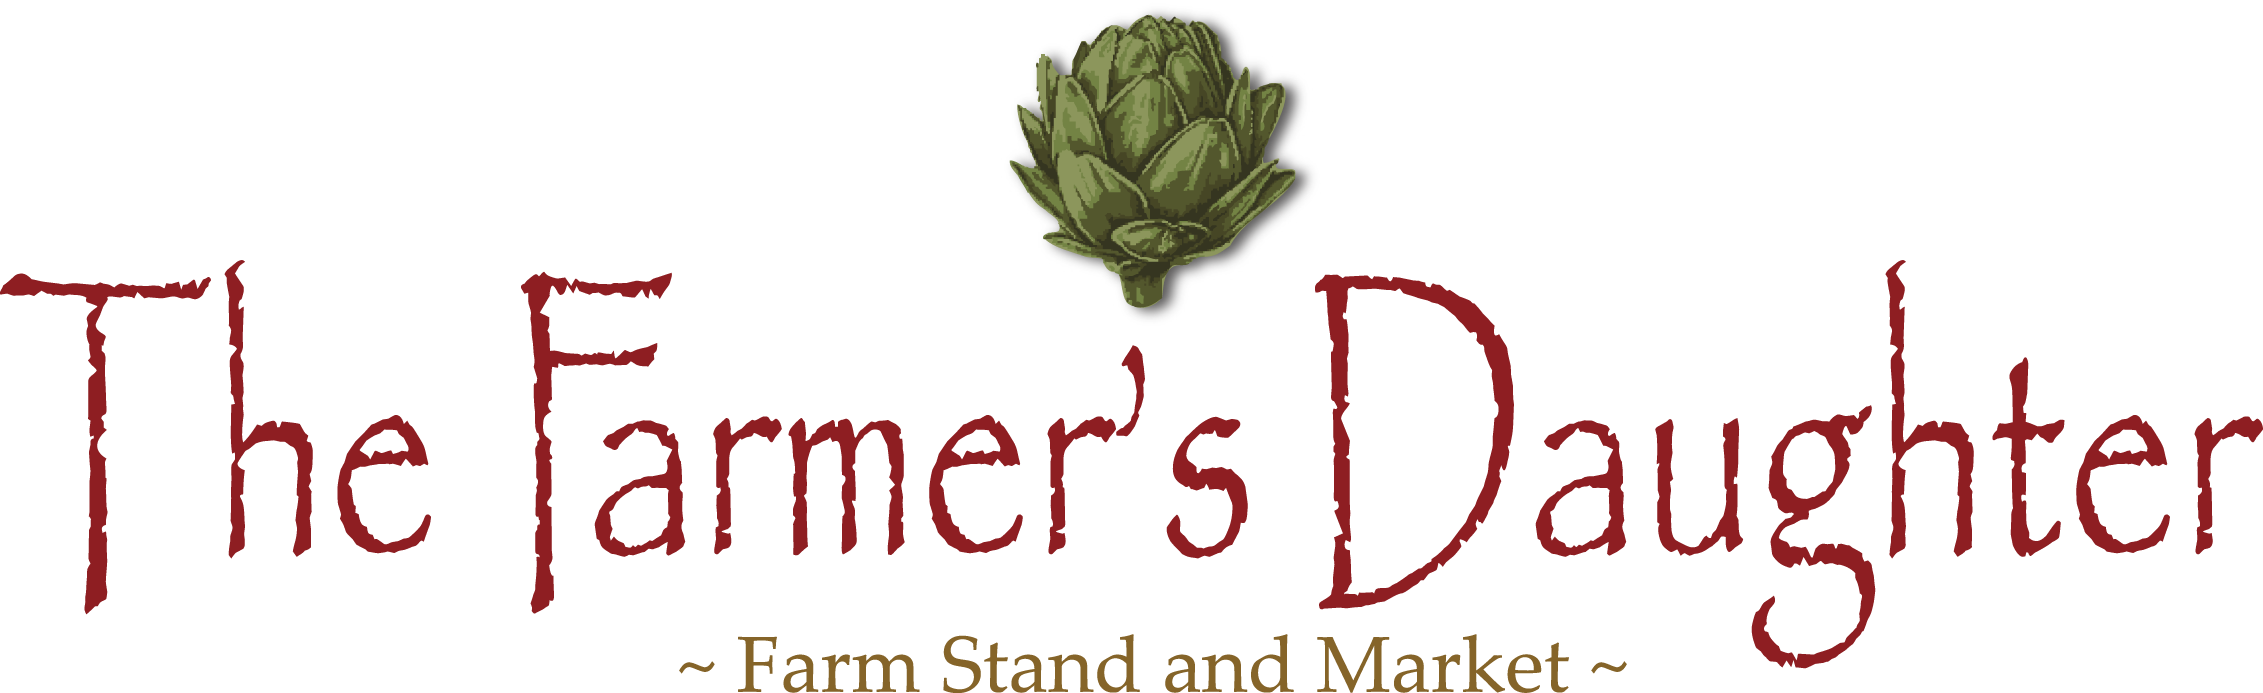 Farmers Daughter Logo Clear